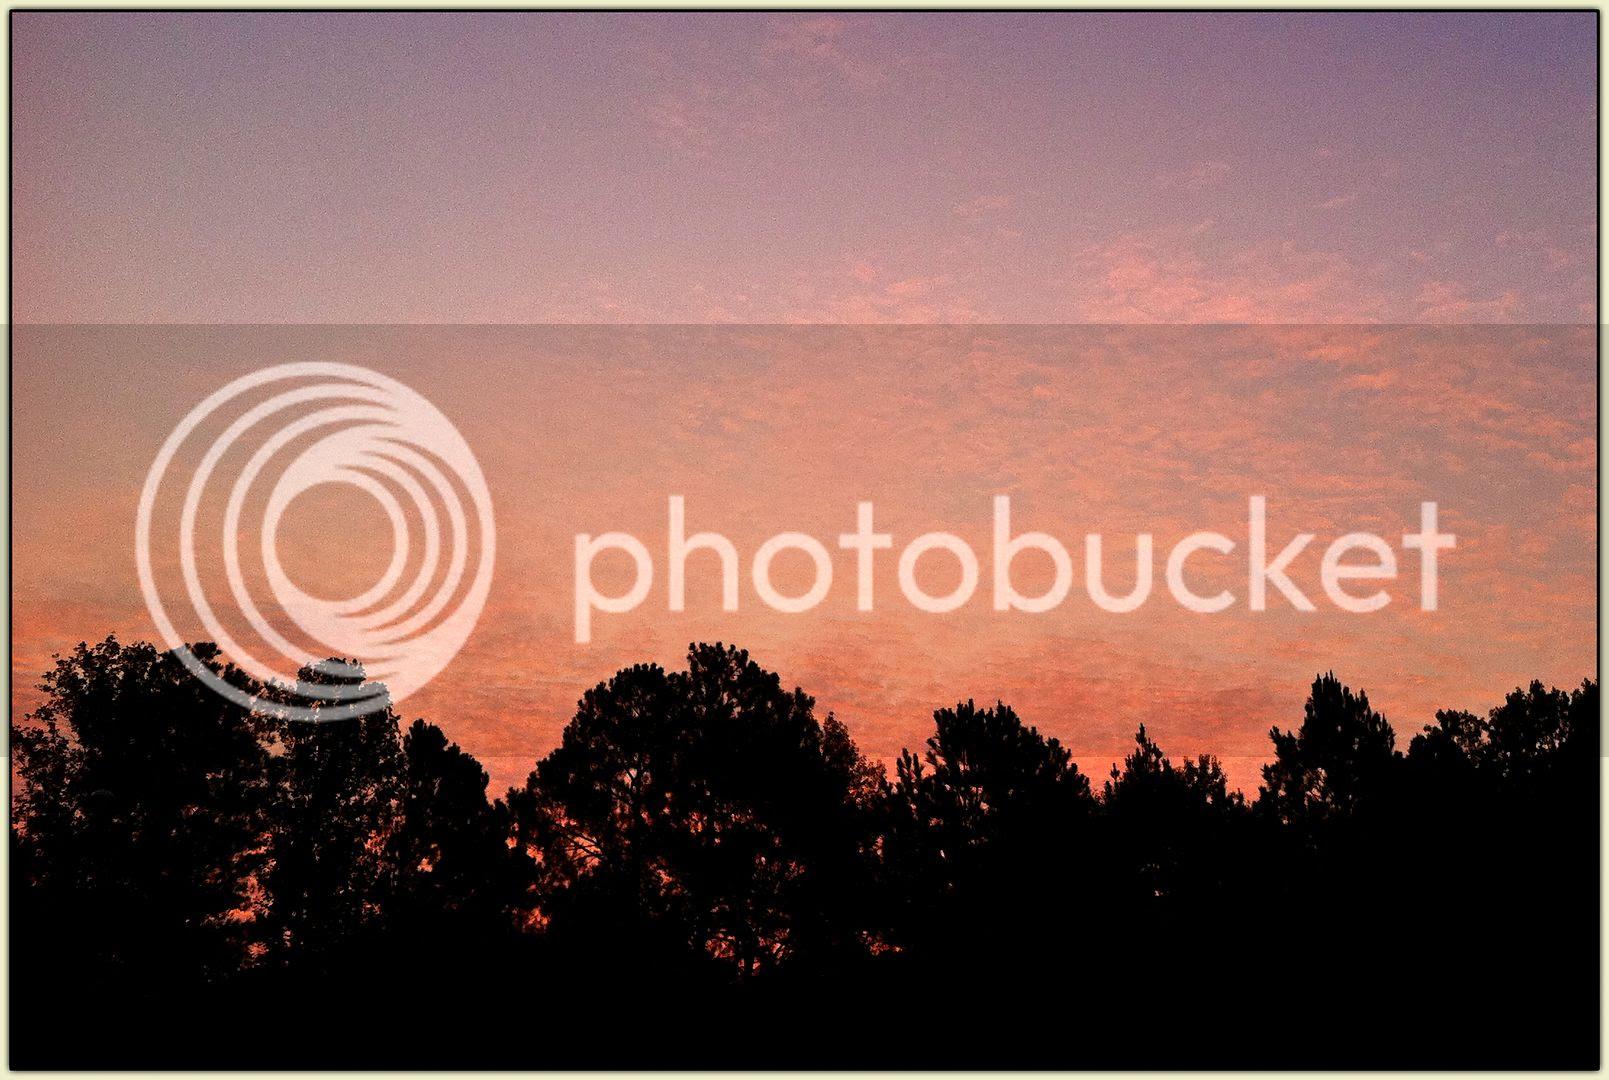 Rosy-Fingered Dawn